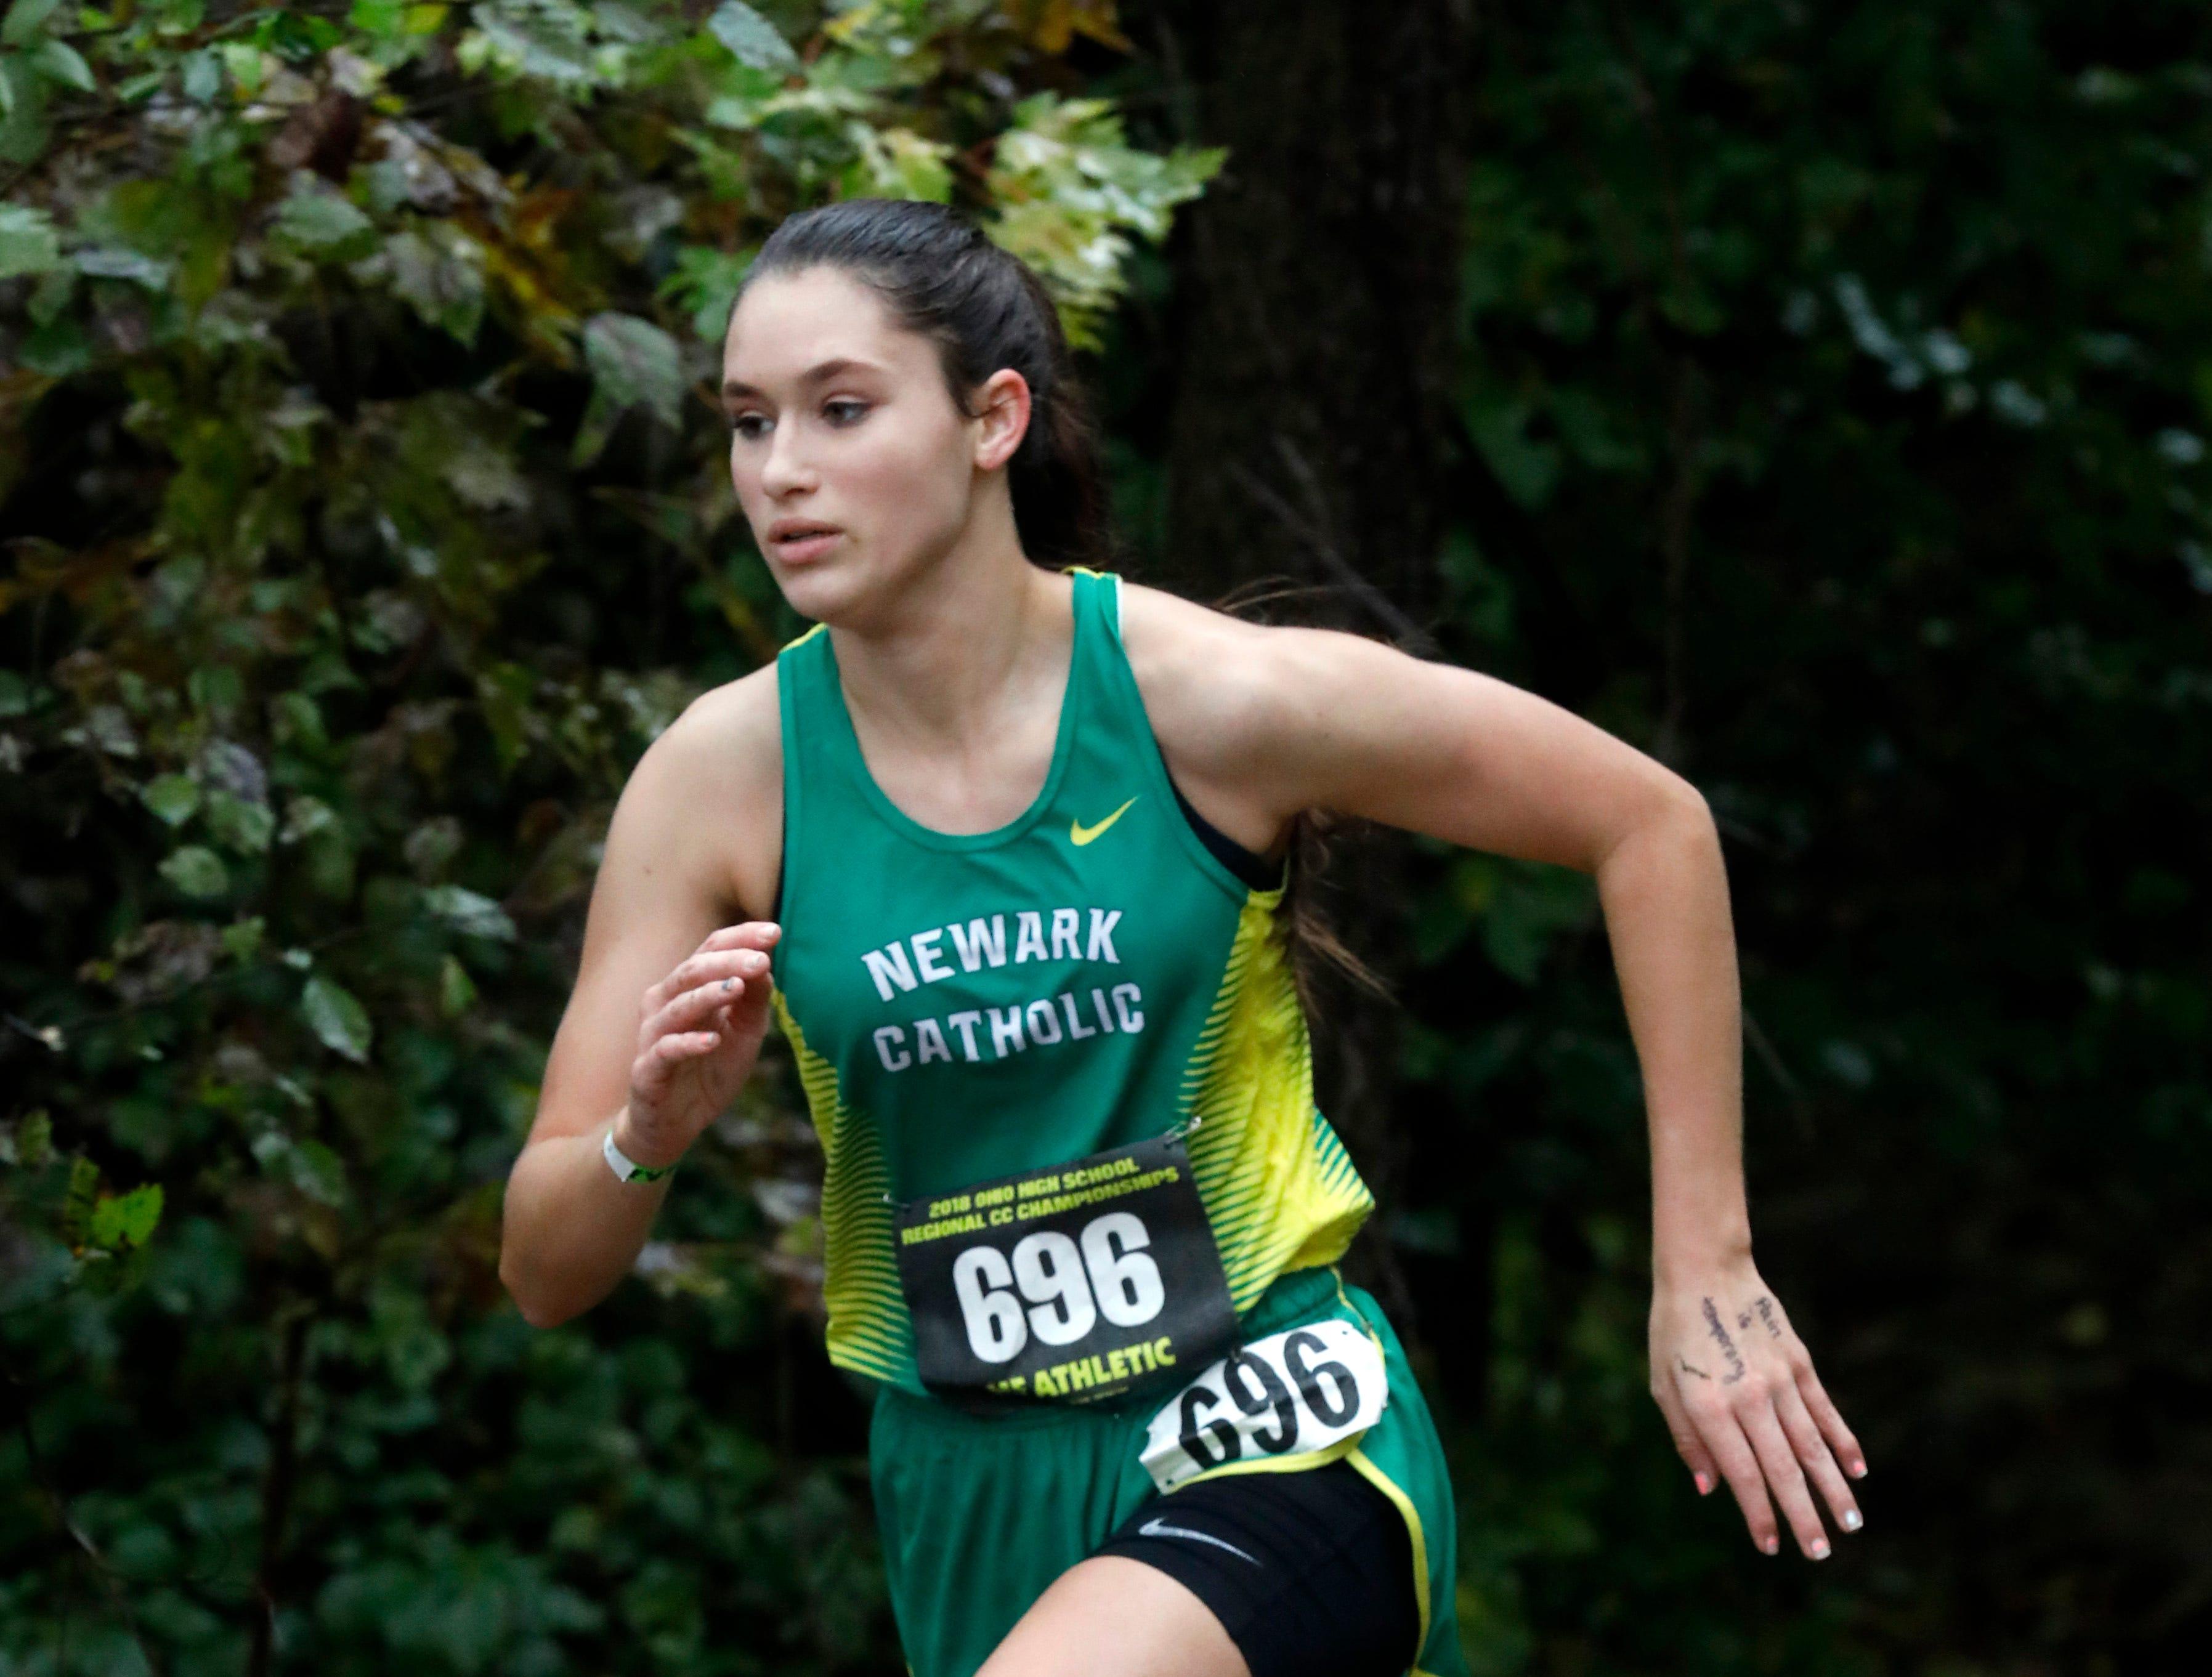 Newark Catholic's Jeannette Miller runs in the Regional Cross Country meet Saturday, Oct. 27, 2018, at Pickerington North High School in Pickerington.